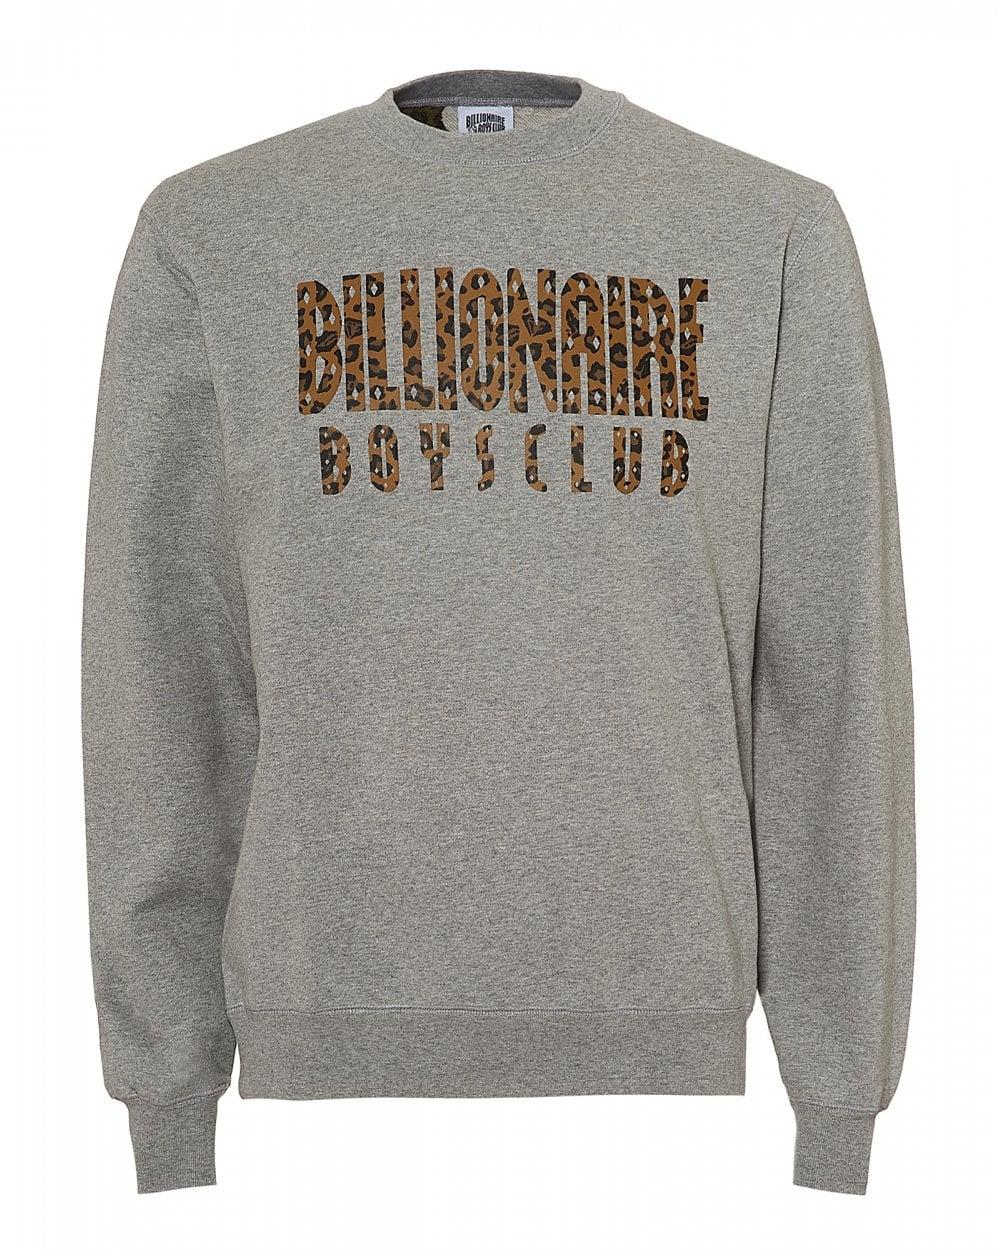 94b39746 Billionaire Boys Club Mens Reversible Sweatshirt, Camo Grey Sweat